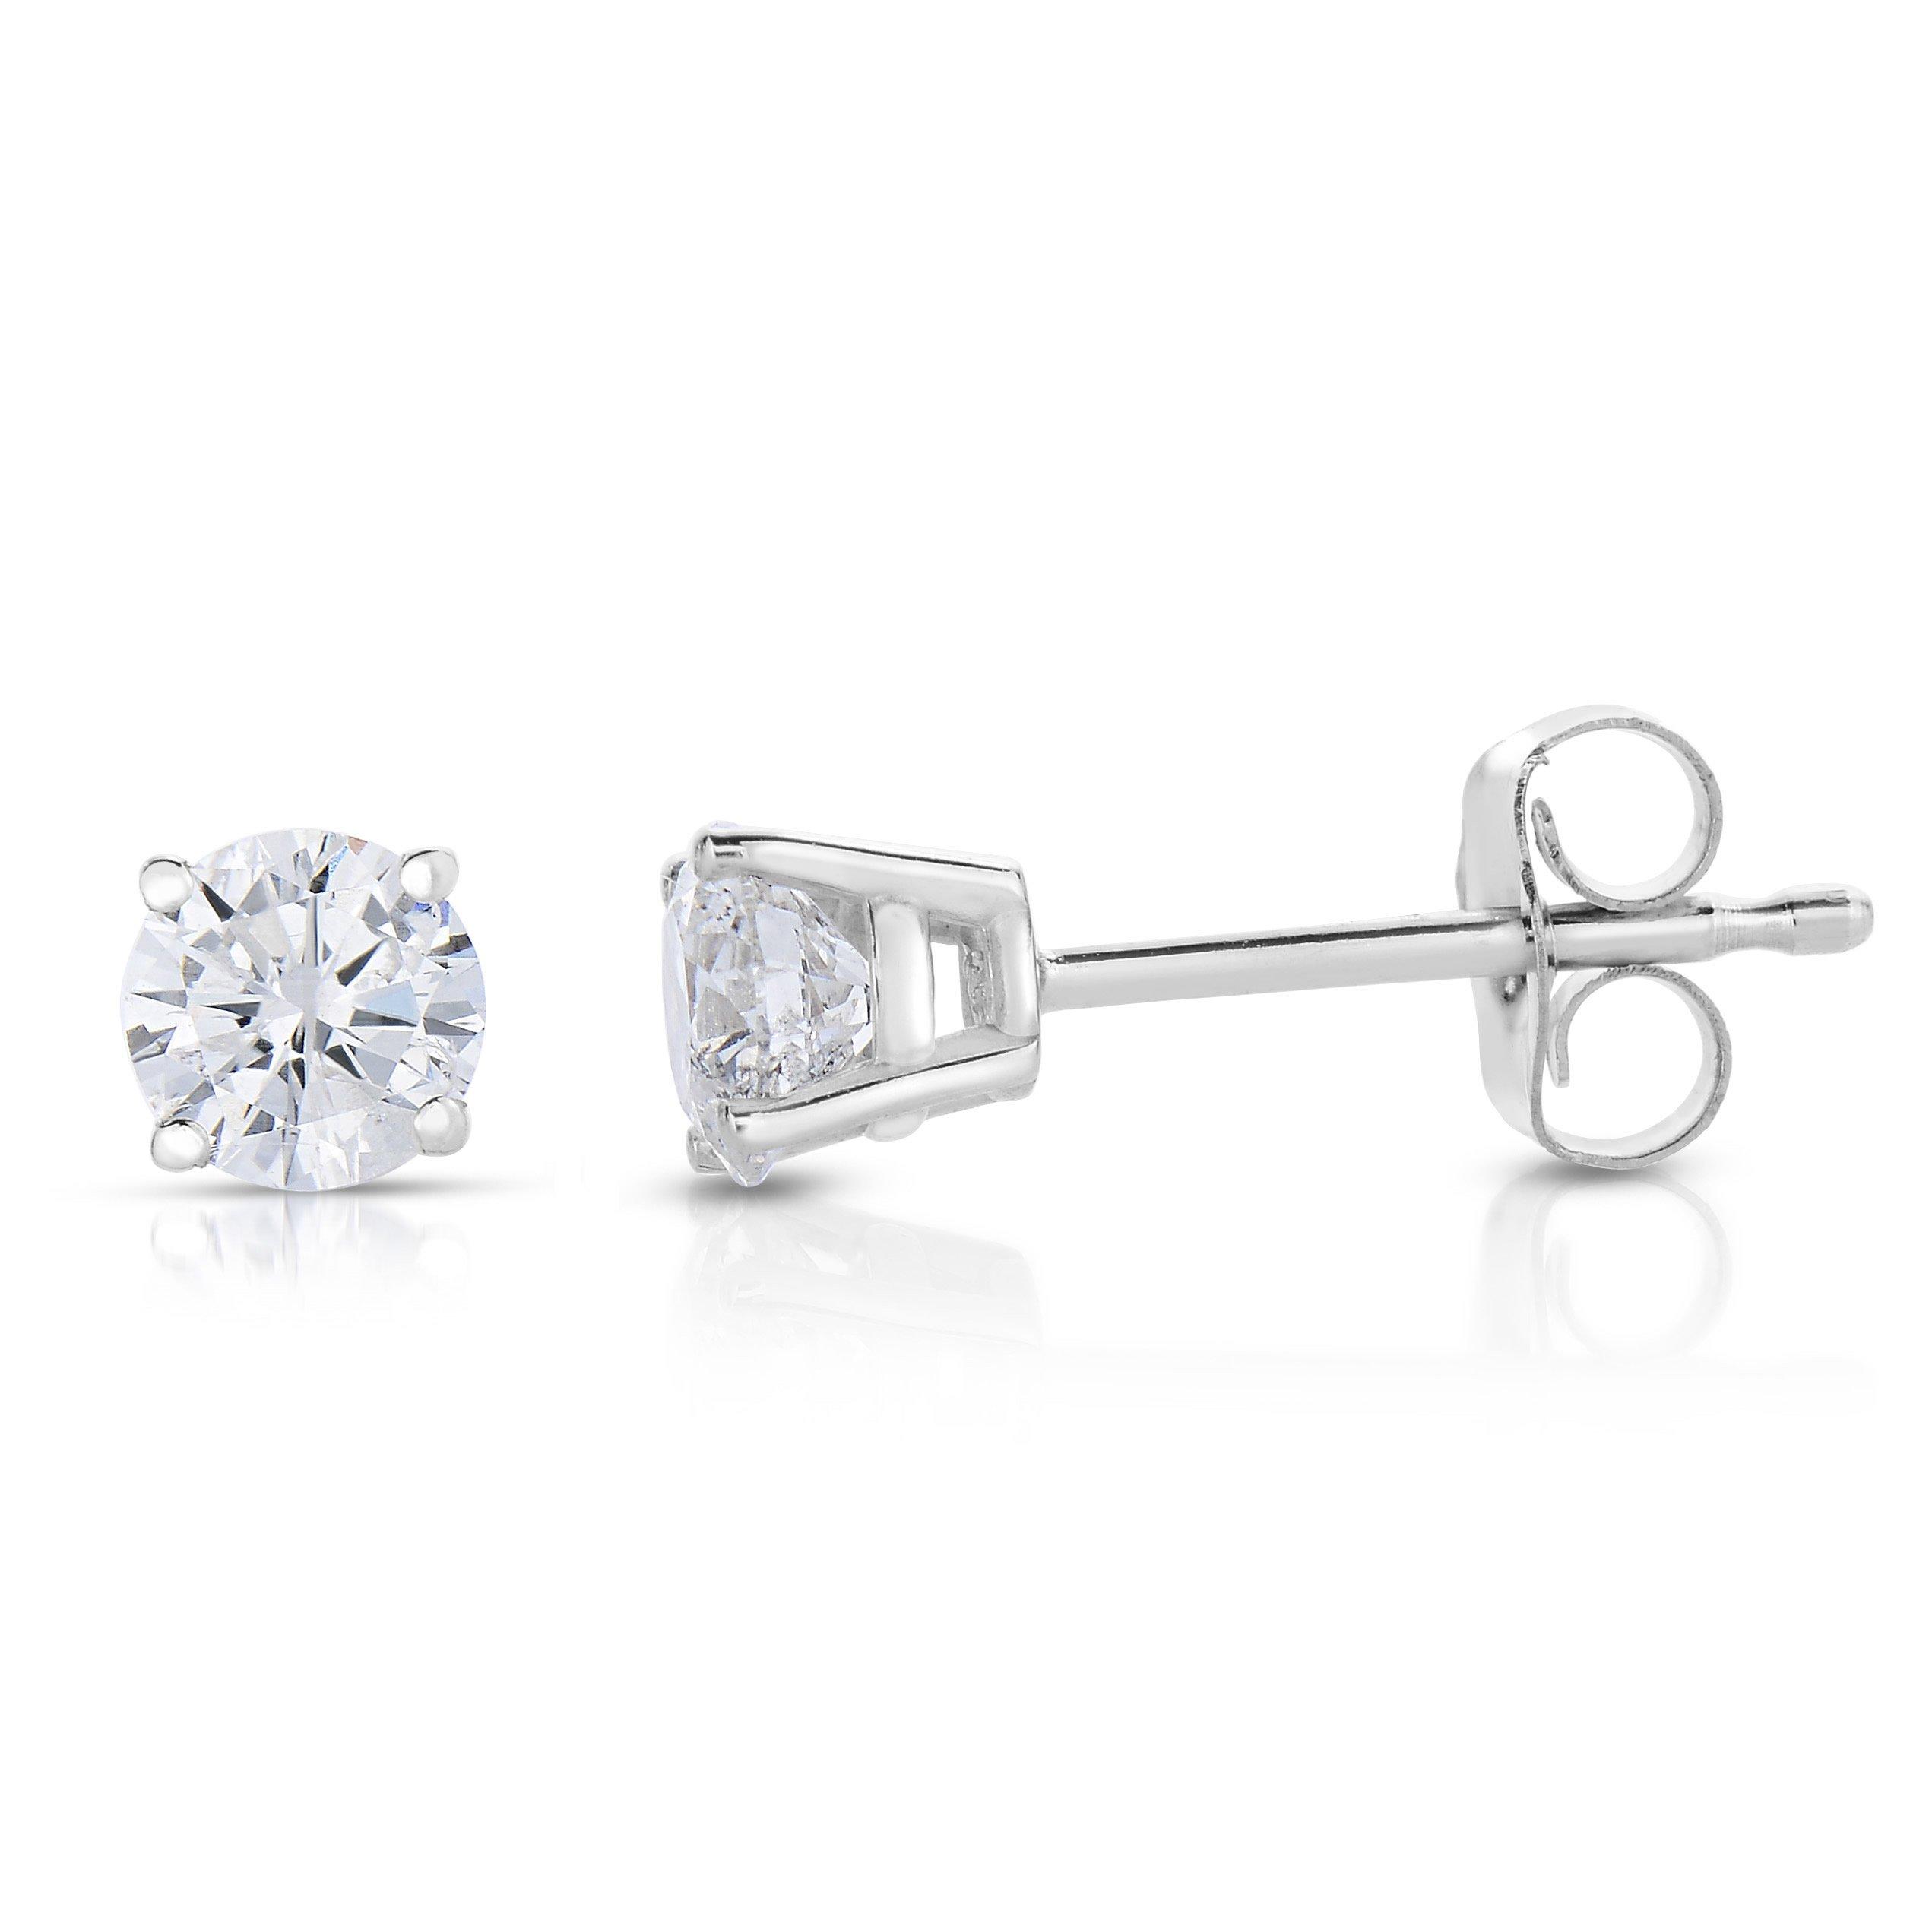 14k White Gold IGI Certified Diamond Stud Earrings (1/3cttw, I-J Color) by Vir Jewels (Image #3)